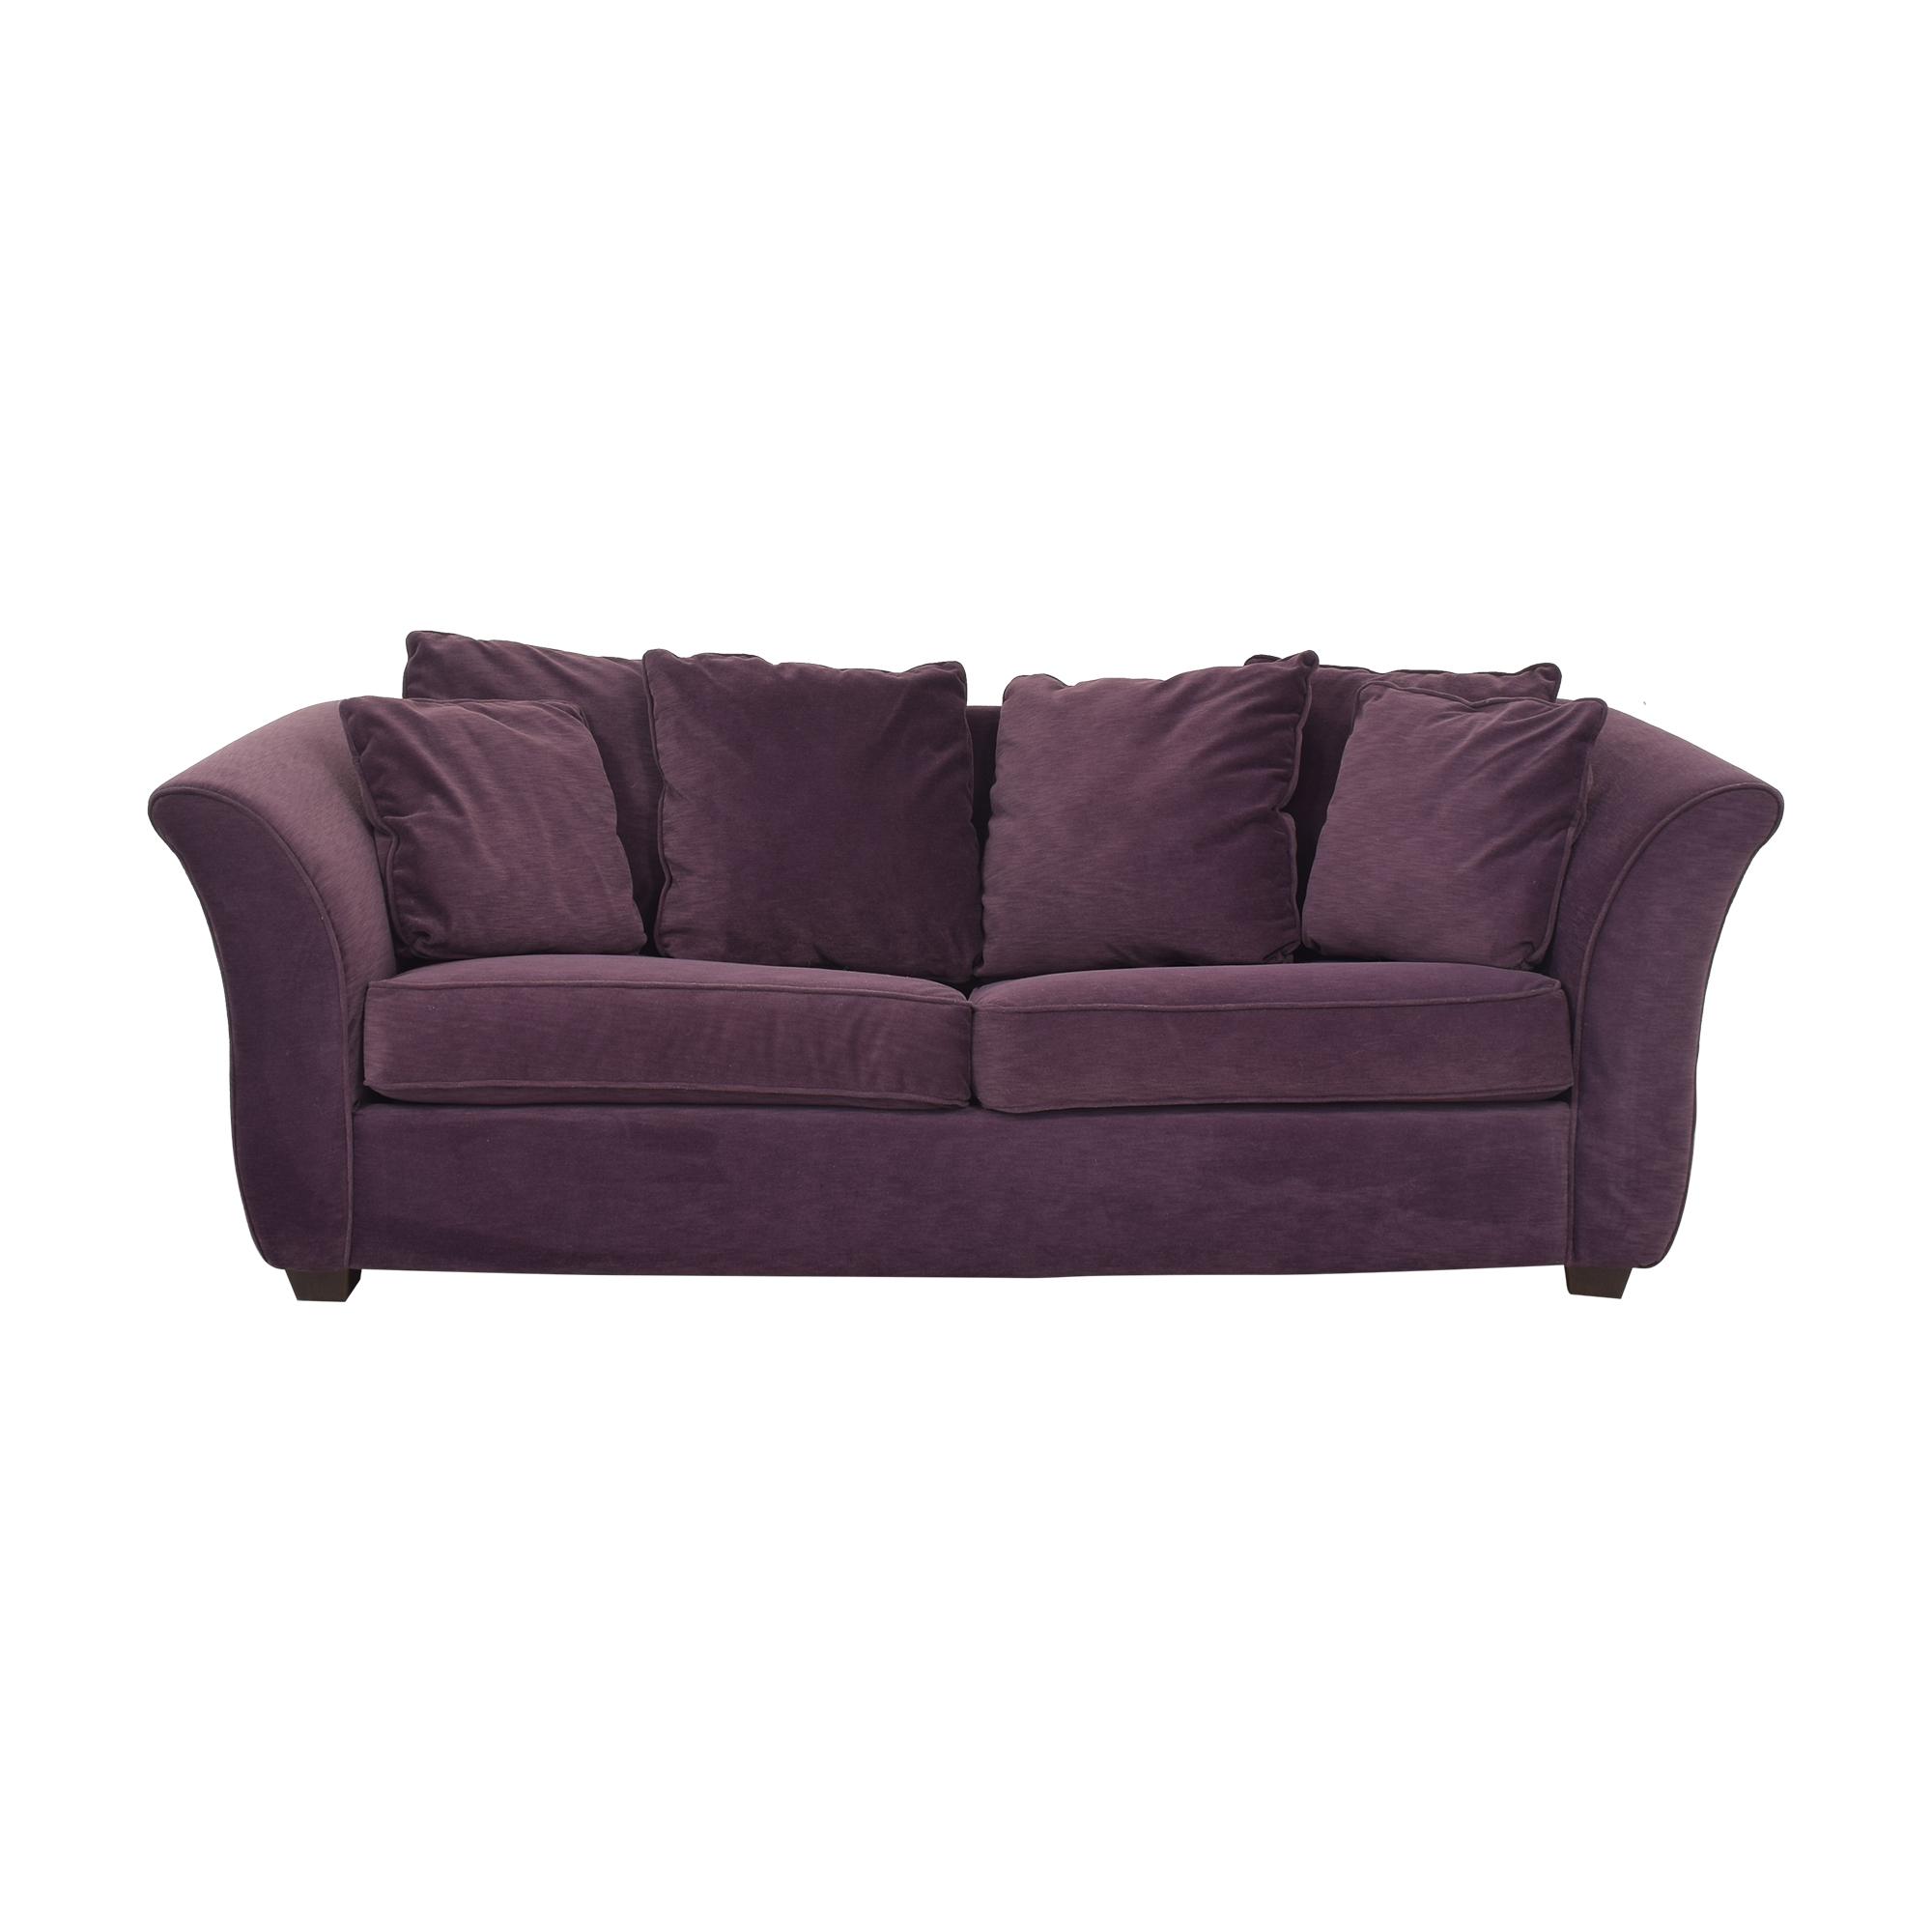 Taylor Made Sleeper Sofa Taylor Made Furniture